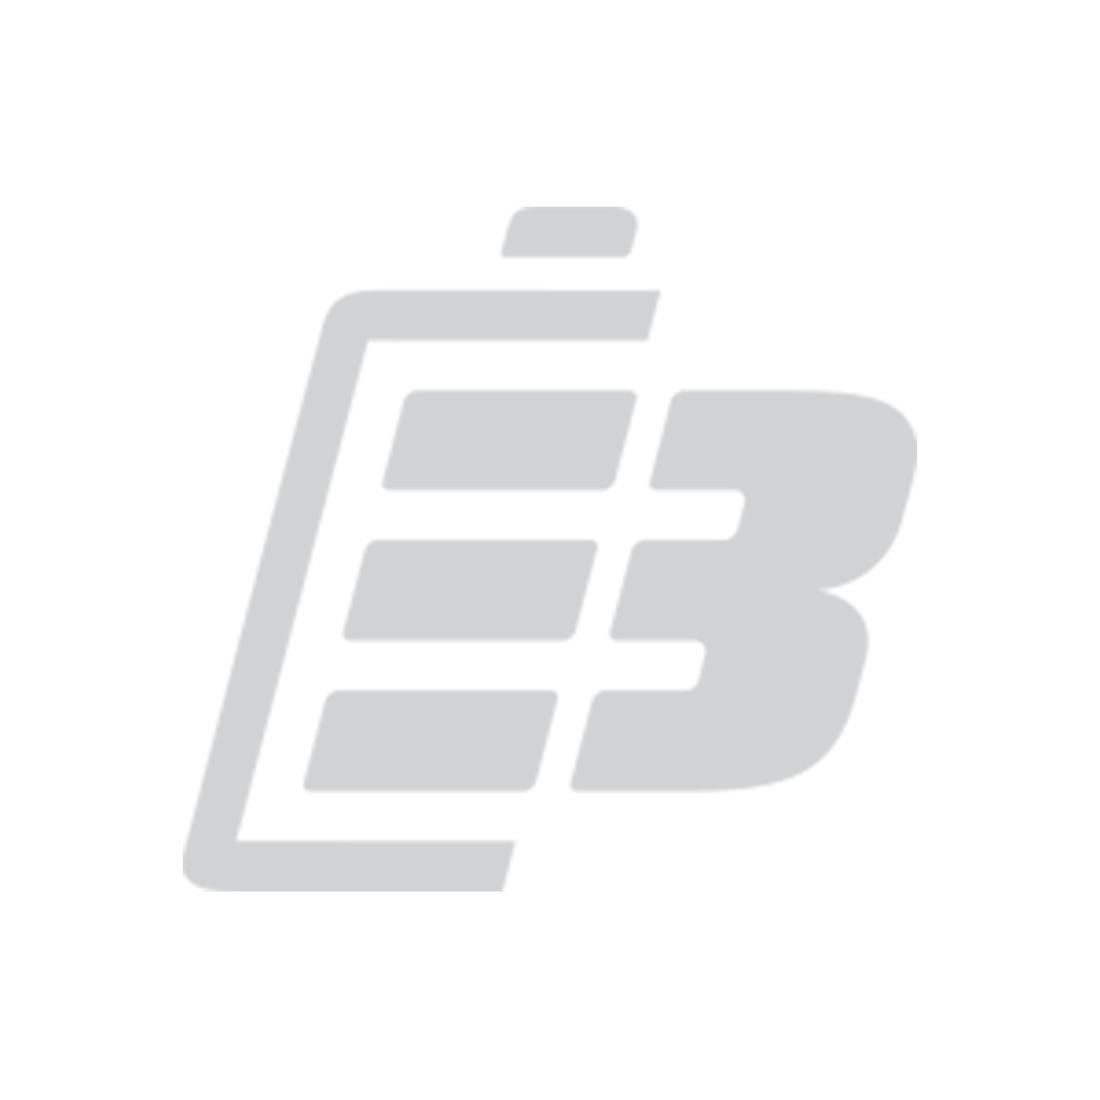 Fenix CL26R Camping Lantern Green